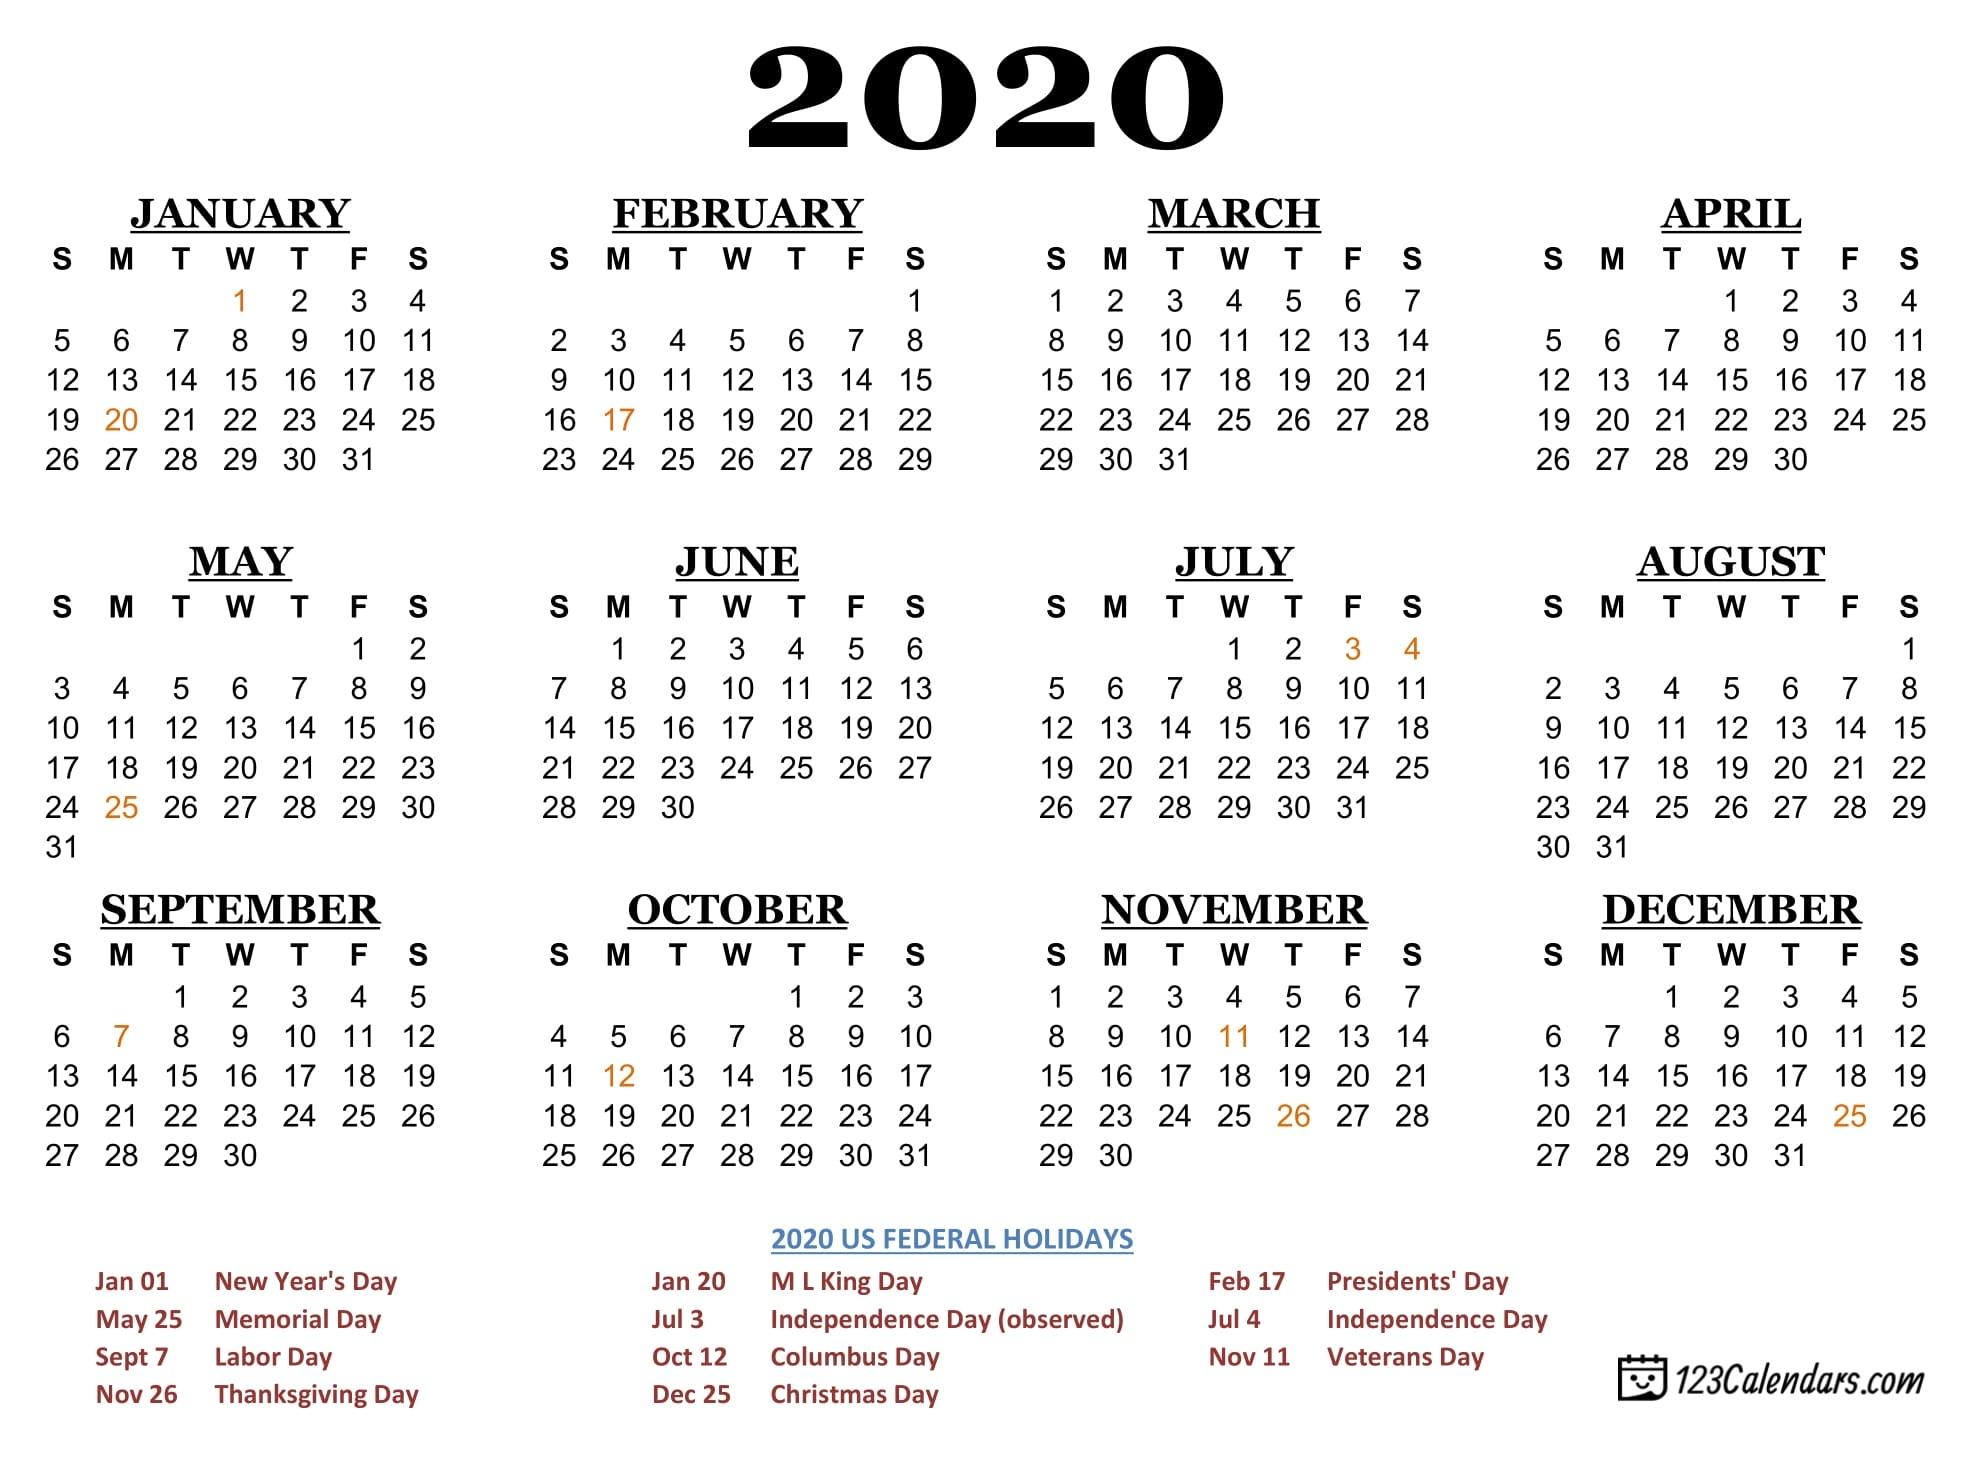 Calendar For Year 2020 Us - Colona.rsd7 Free Printable Christmas Calendar 2020